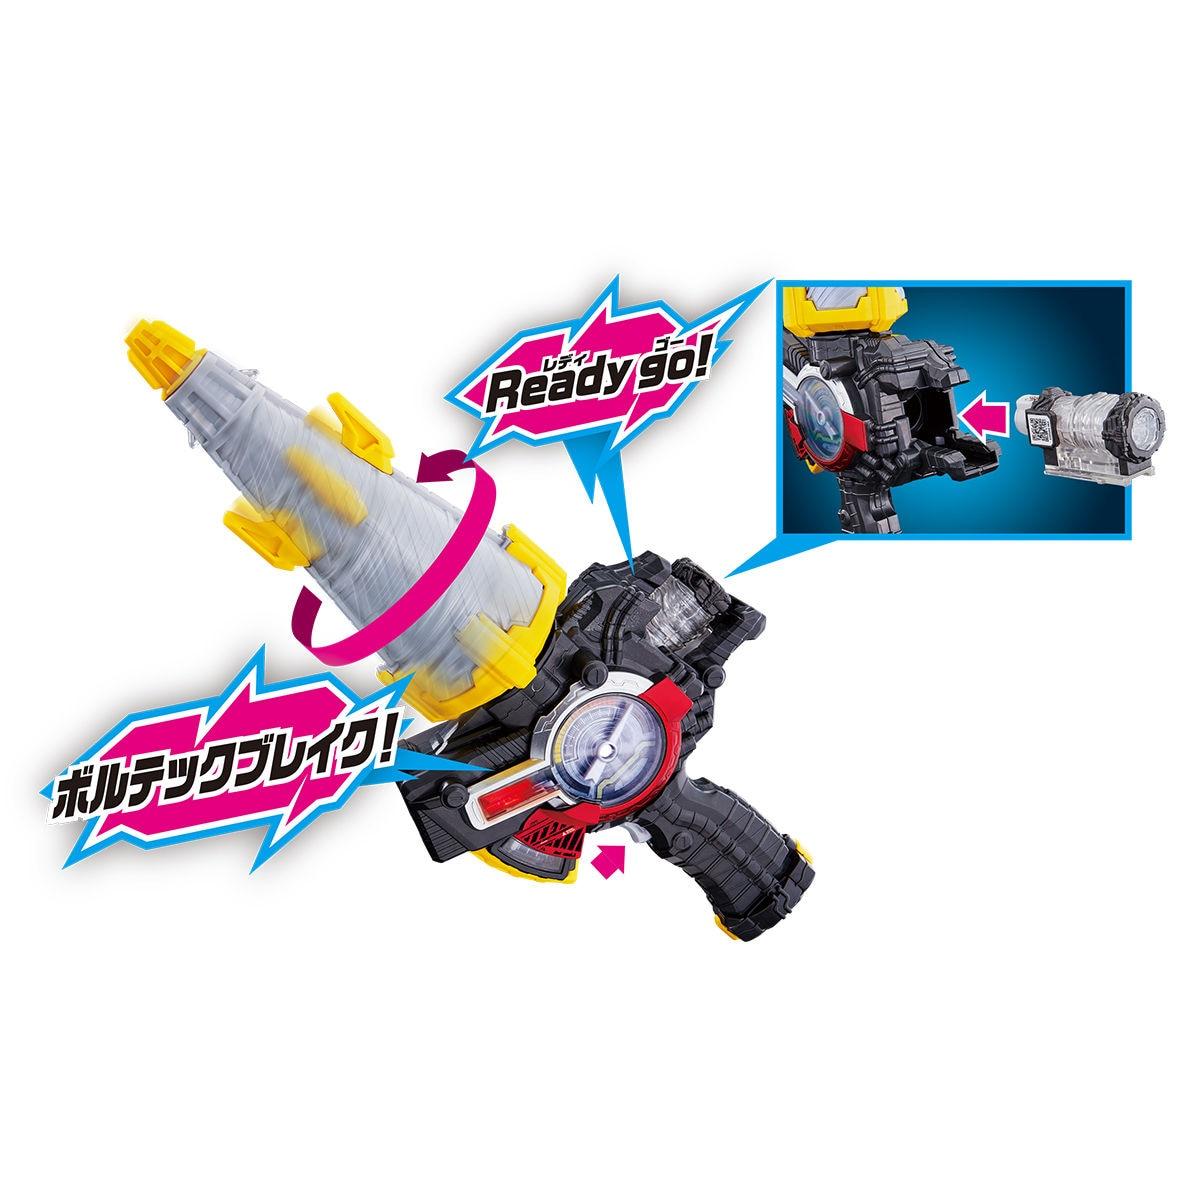 Image 3 - Kamens ライダー構築ドリル Smasher DX 武器リンクすることがフルボトルアクション図クリスマスギフト子供のためのアクション & トイ フィギュア   -